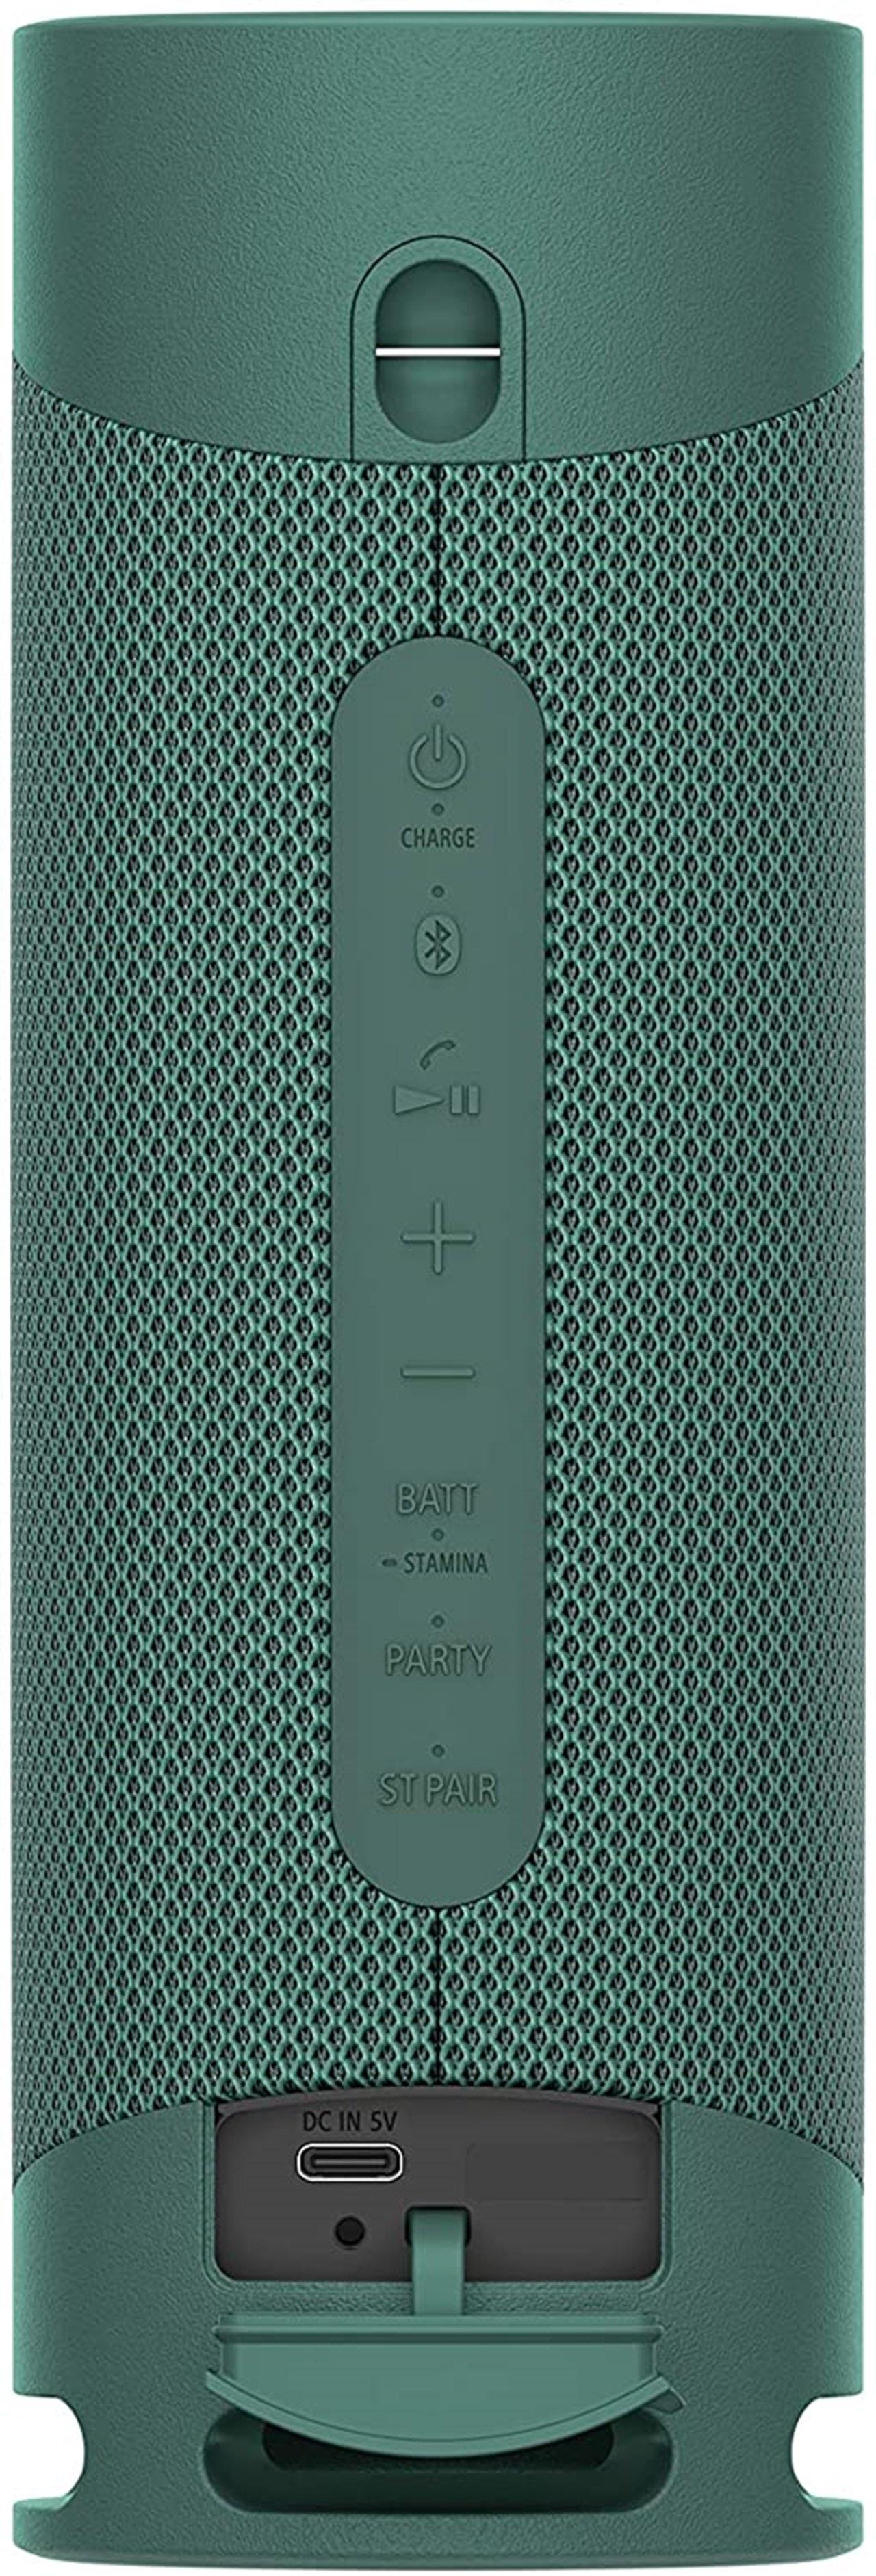 Sony SRSXB23 Green Bluetooth Speaker - 2